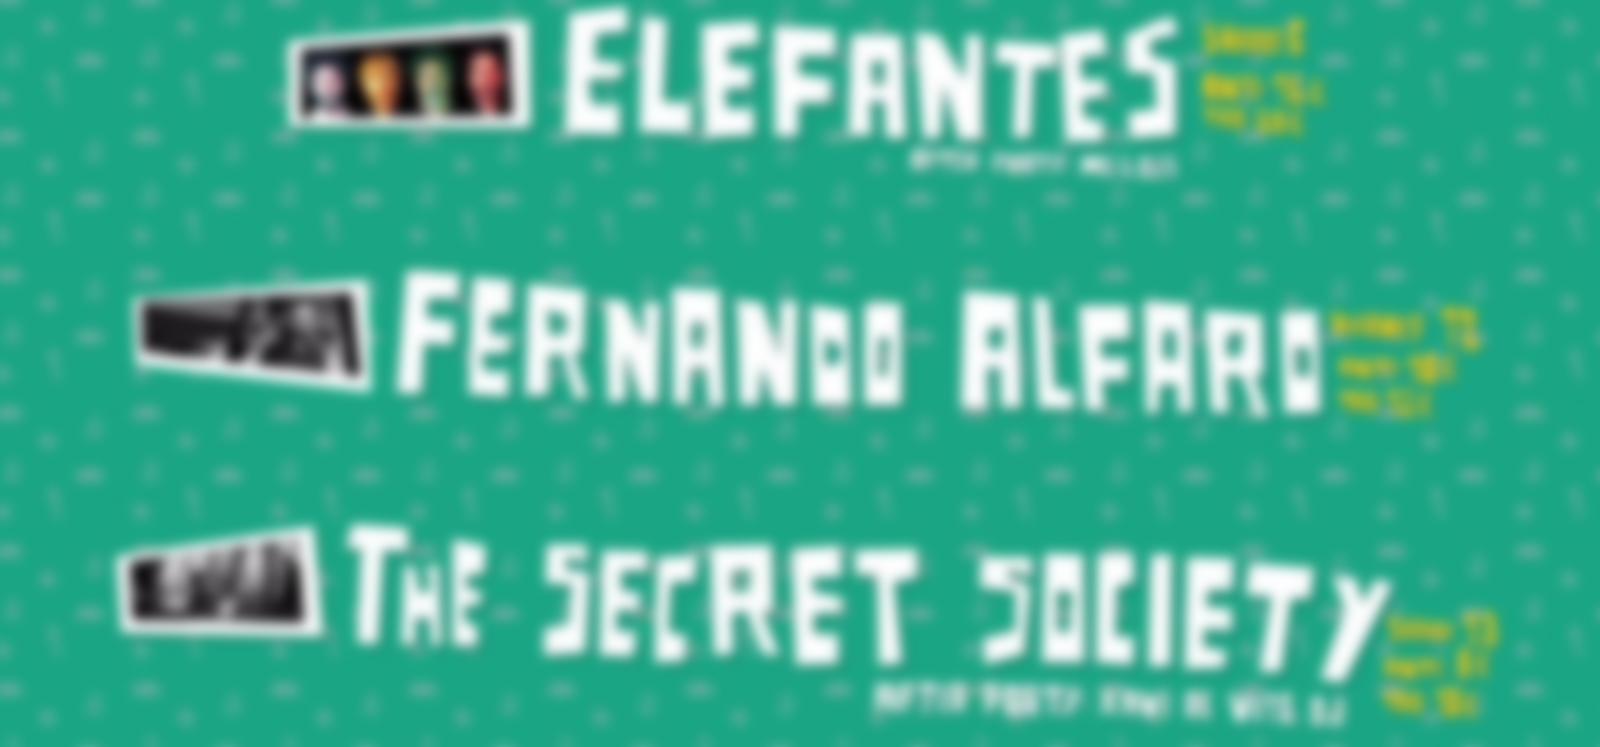 ElVeintiuno_feb16_fondo